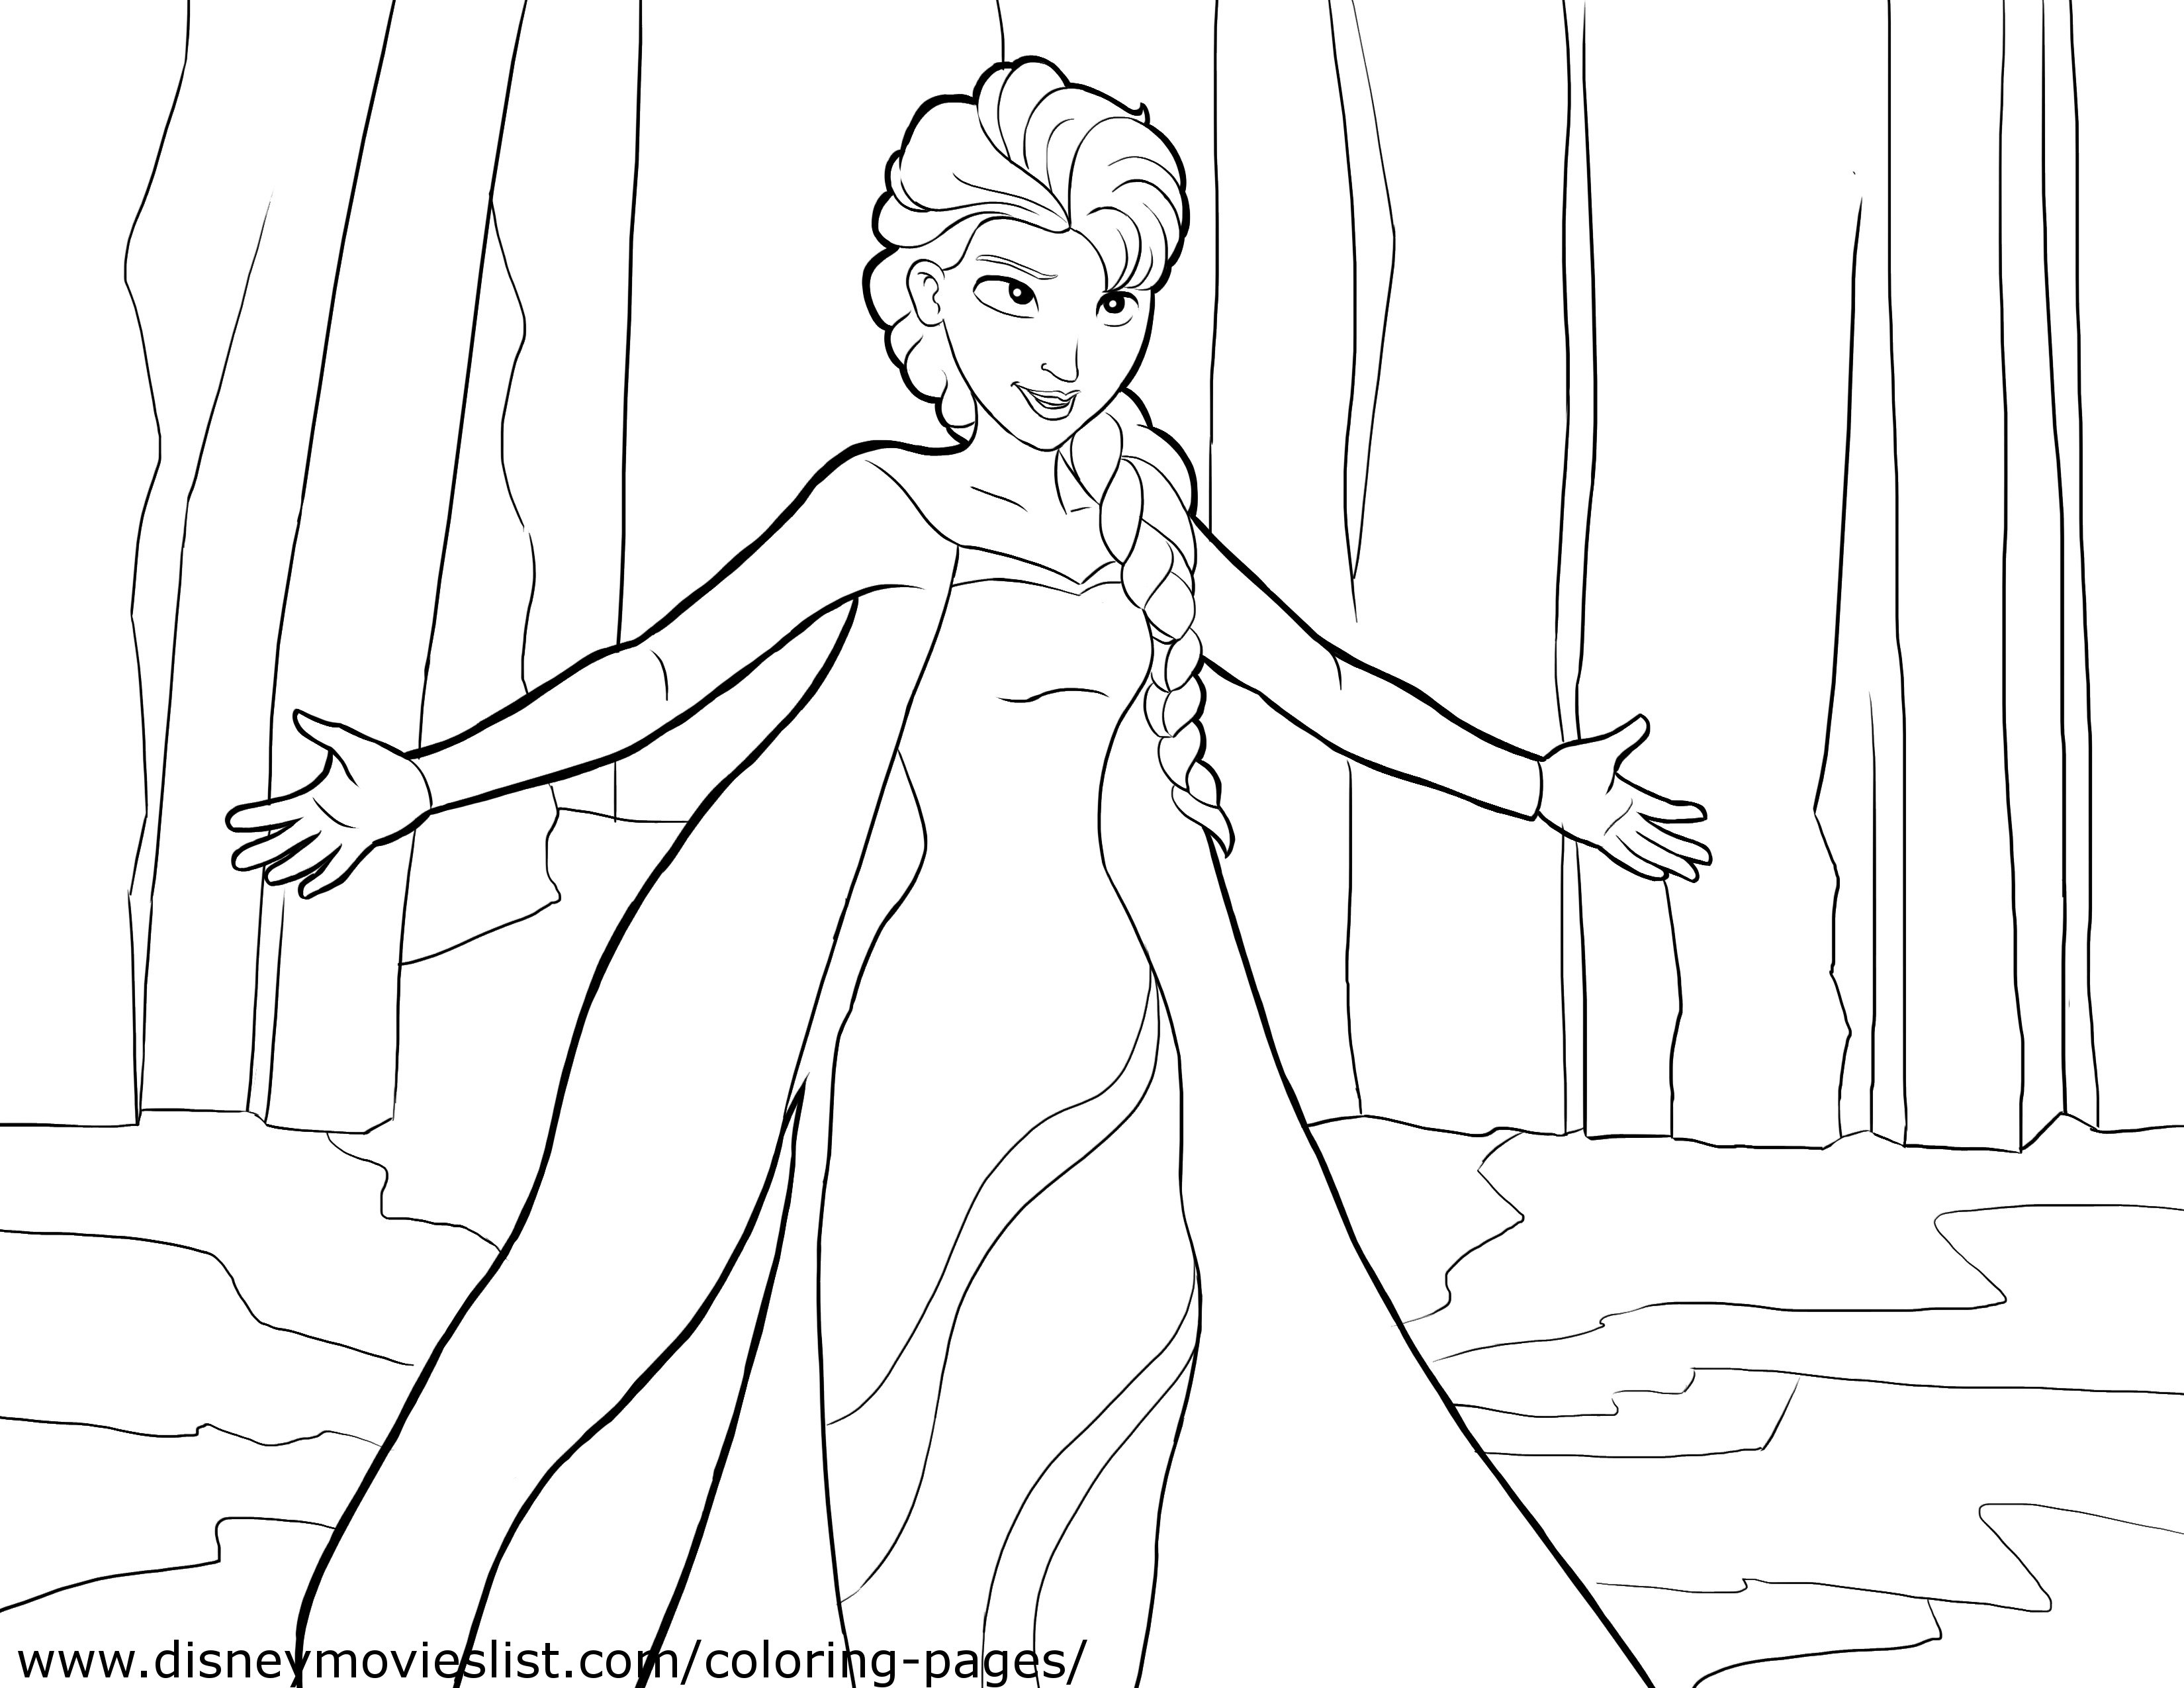 Elsa Coloring Page - Elsa the Snow Queen Photo (36145806) - Fanpop ... | 2550x3300